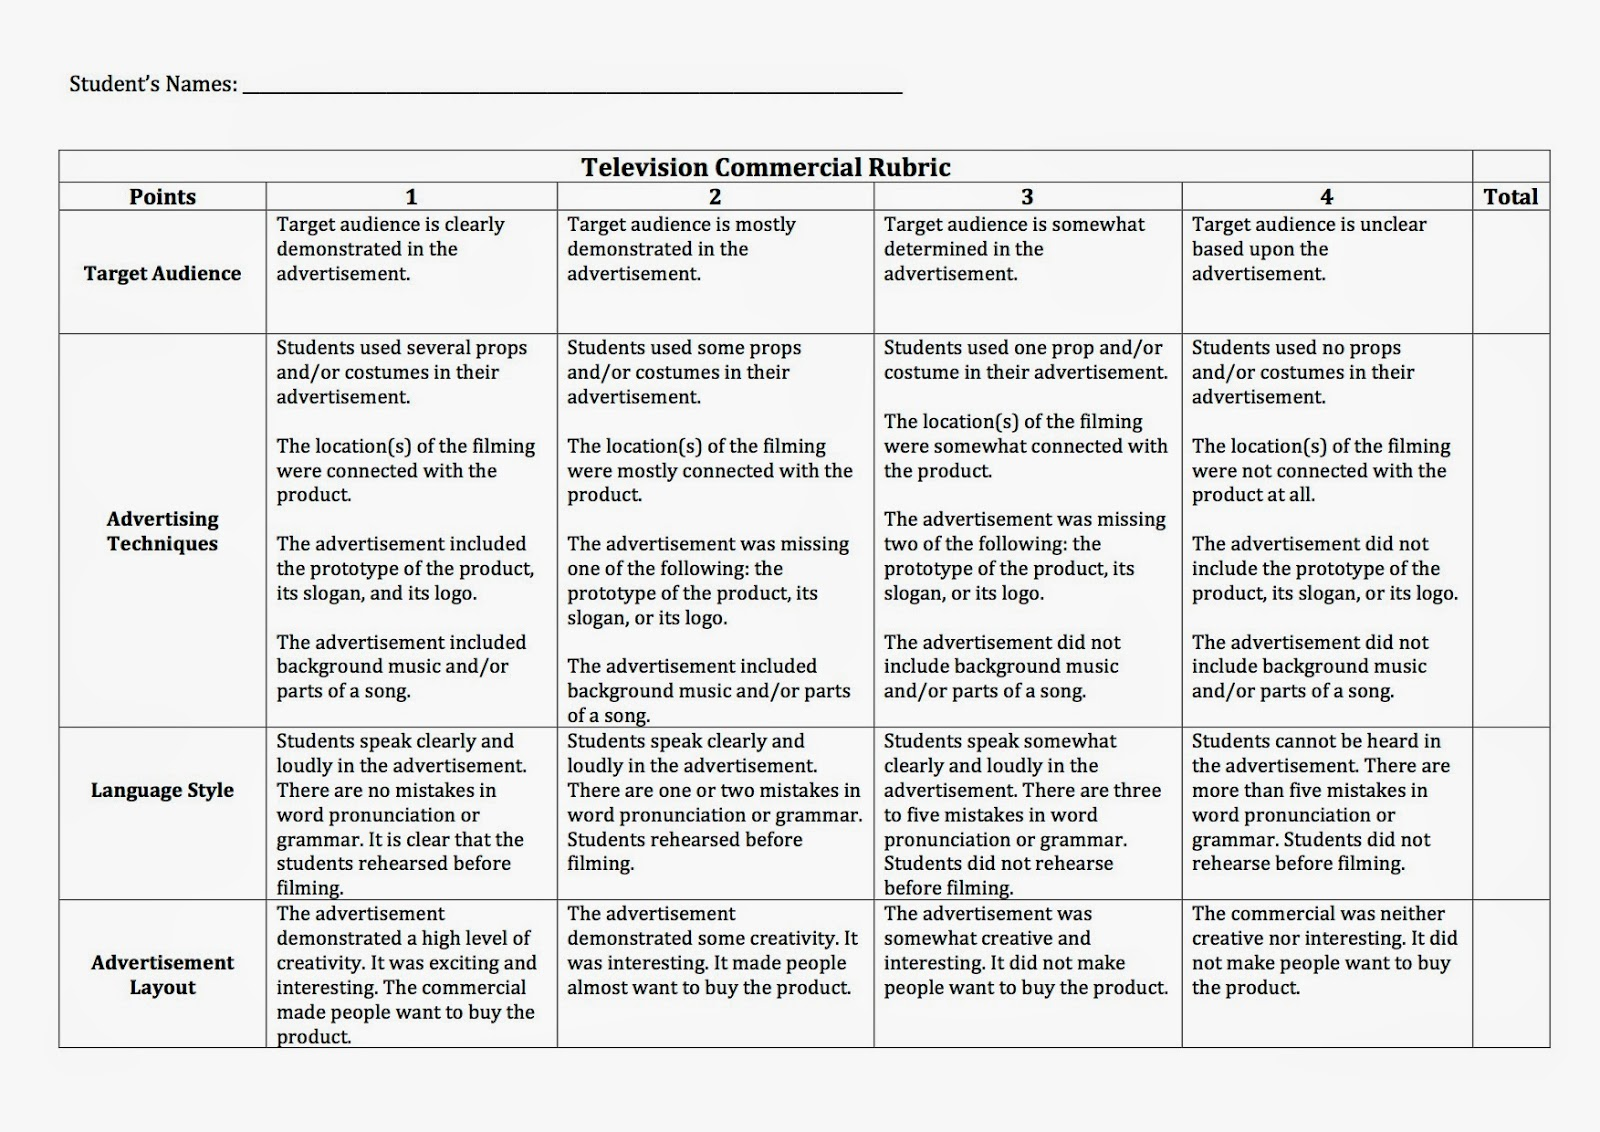 1090 marketing rubric 2014 01 2 Thursday, 2 january 2014 integrative learning project integrative learning project for the integrative learning project (ilp),.